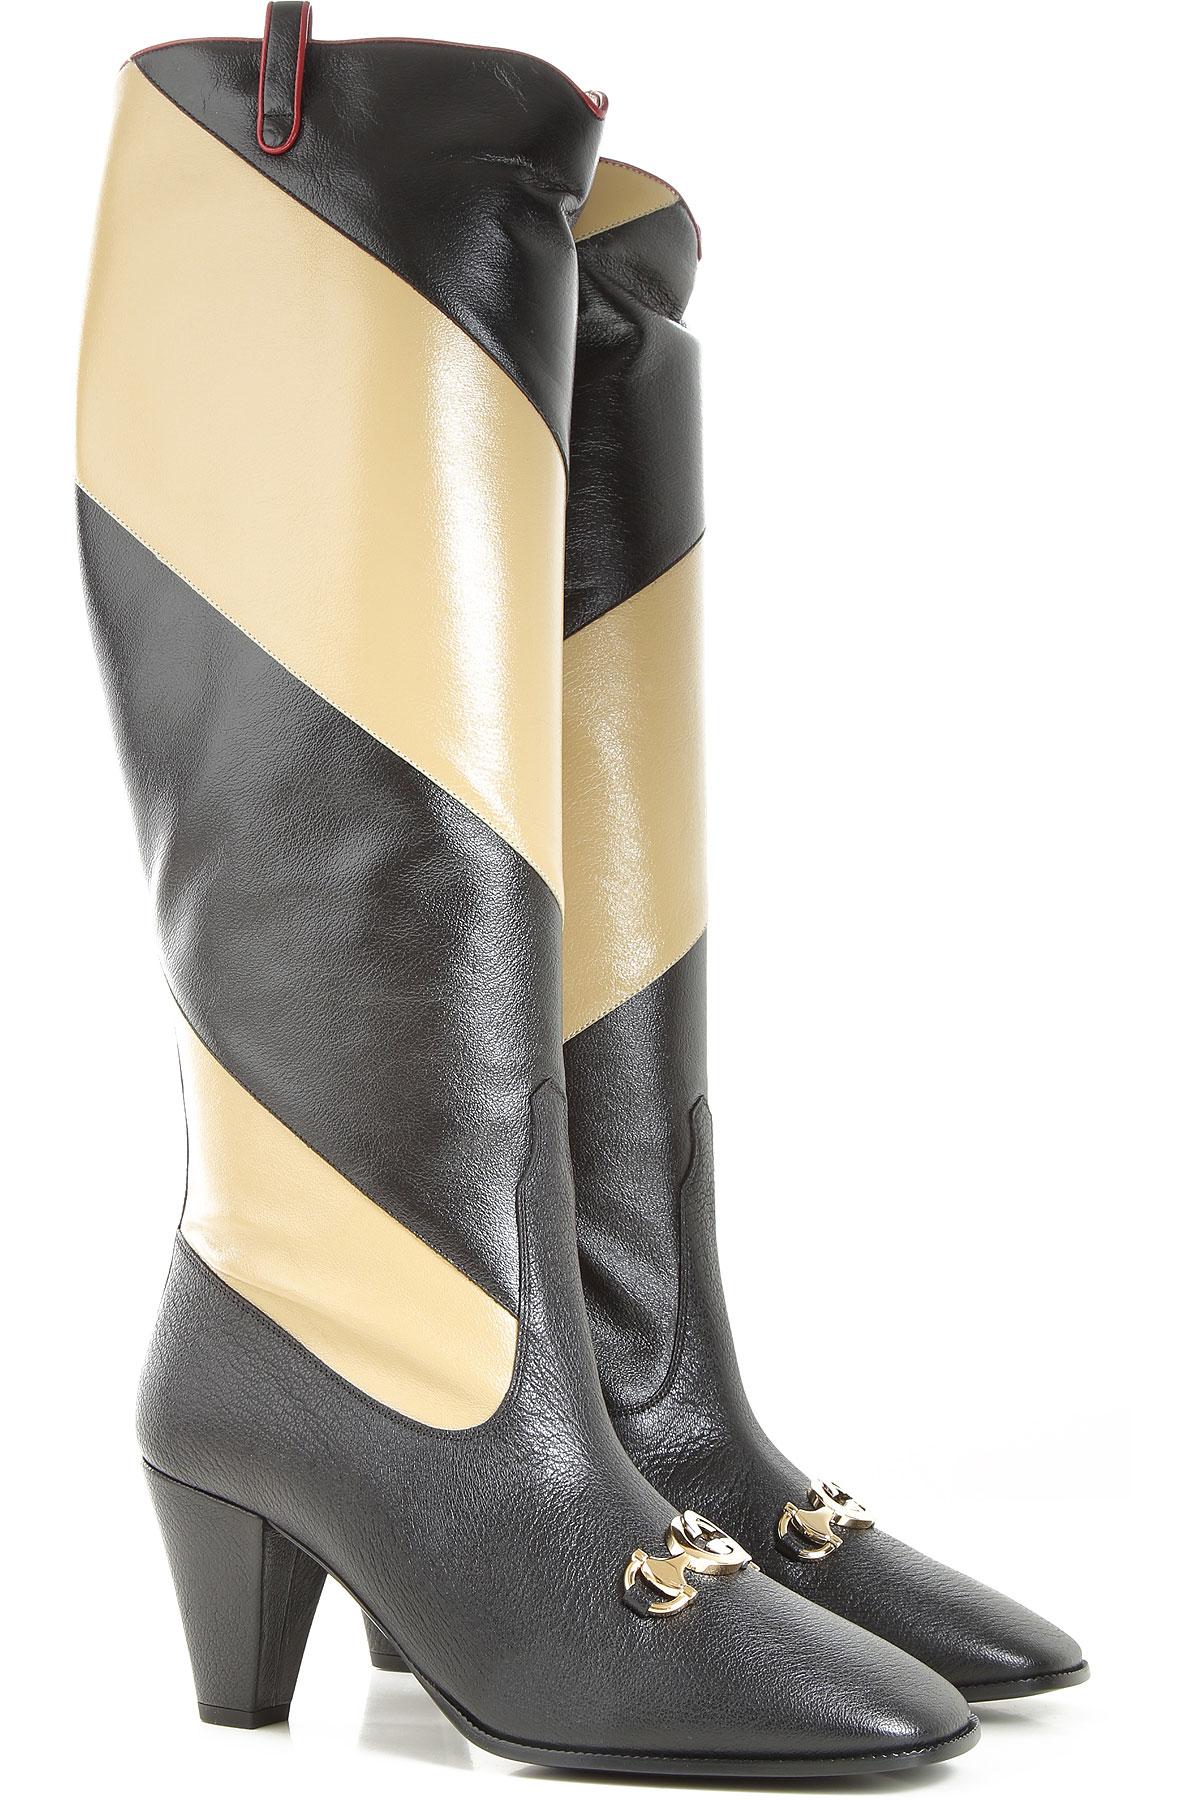 Gucci Boots moterims, Booties, juodi, Textured oda, 2019, 39 40